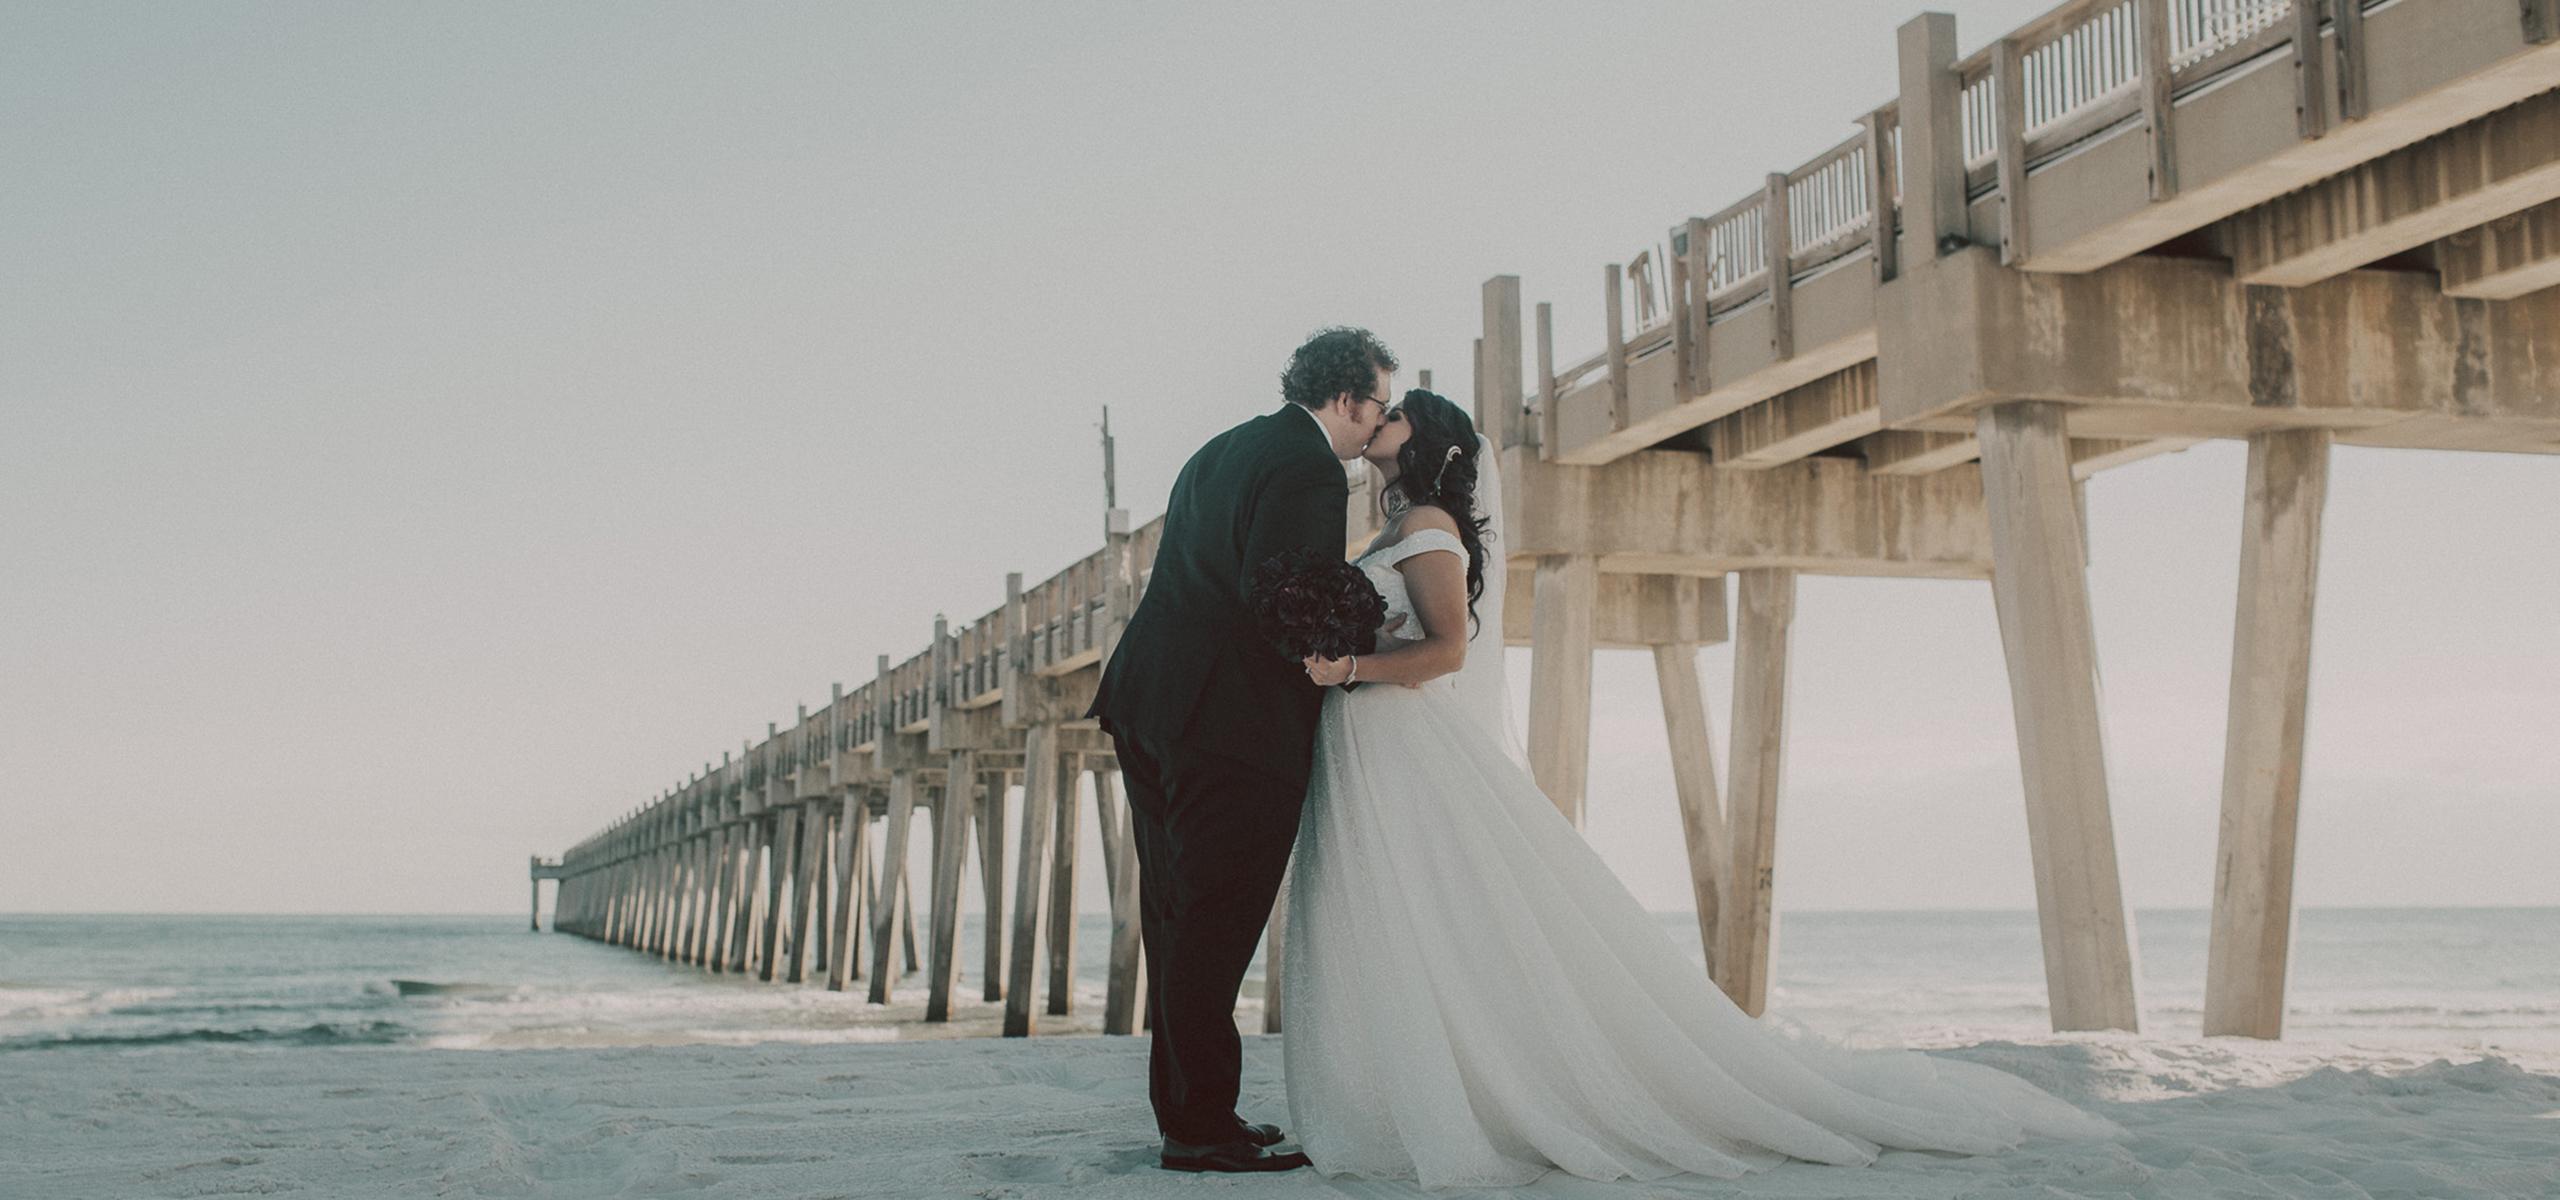 Asbury Park, New Jersey Wedding Photography + Elopement Photography